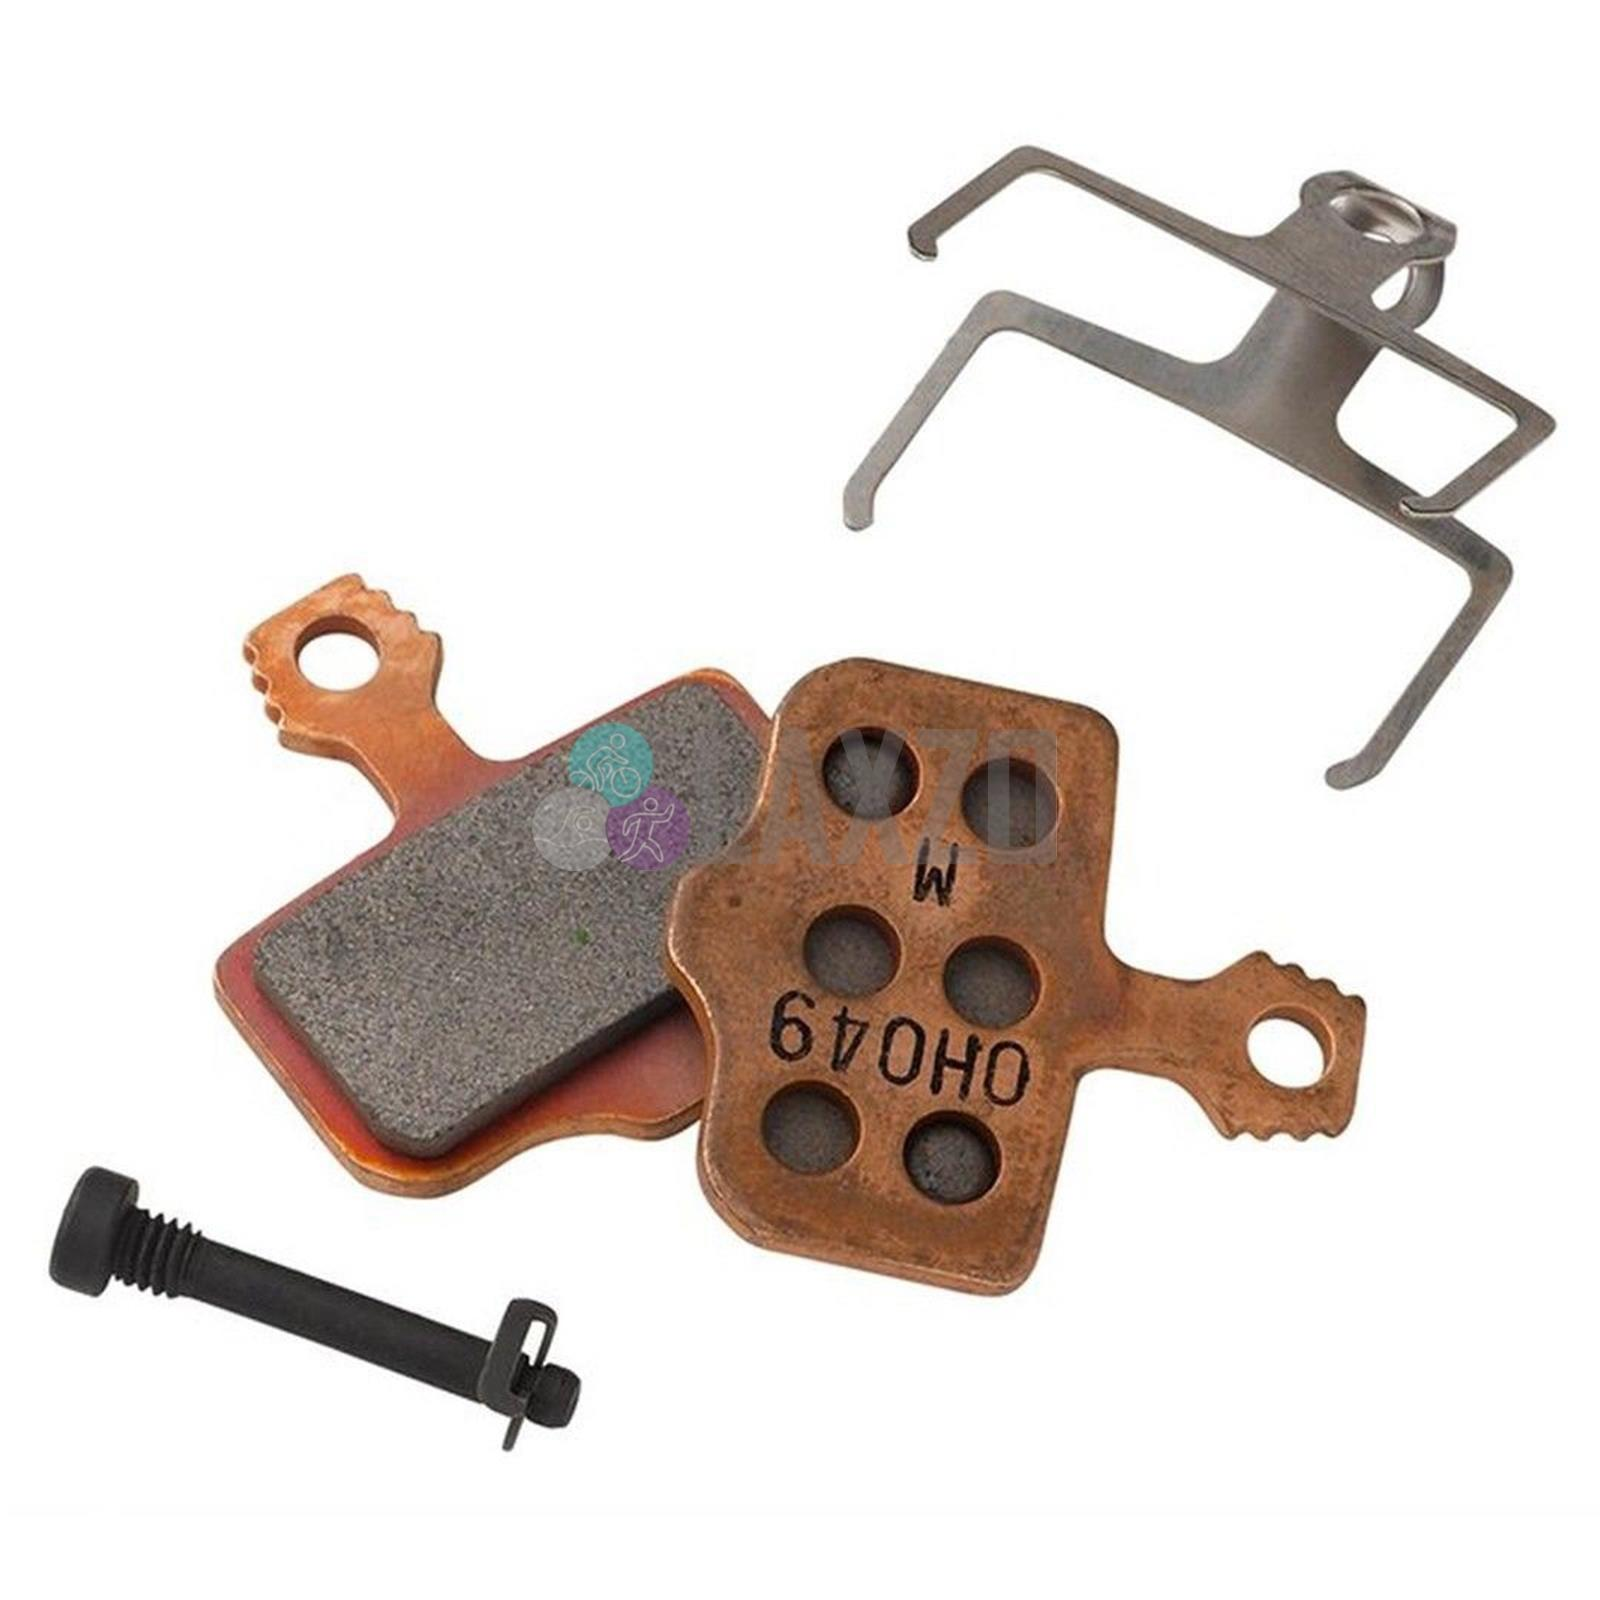 1-Pair Genuine AVID Elixir Sintered Steel Disc Brake Pads for Elixir 1 7 9 XX X0